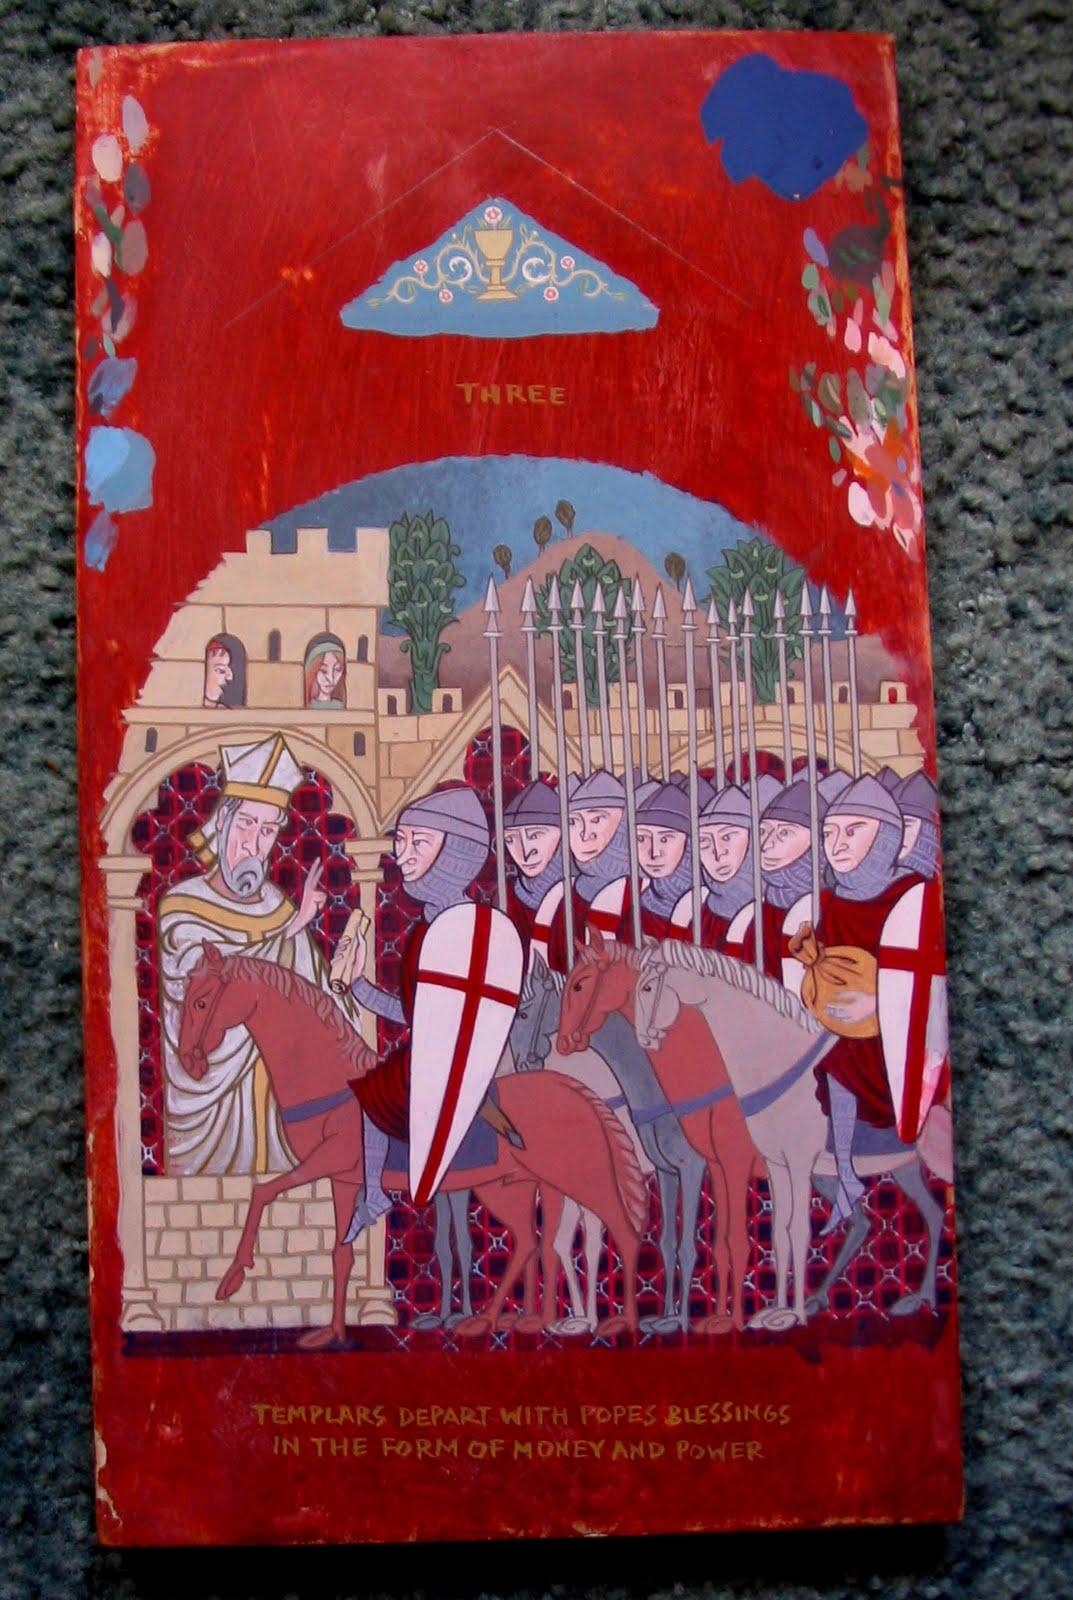 [Da+Vinci+Code.Knights+Templar+Triptych.3.blog+3]